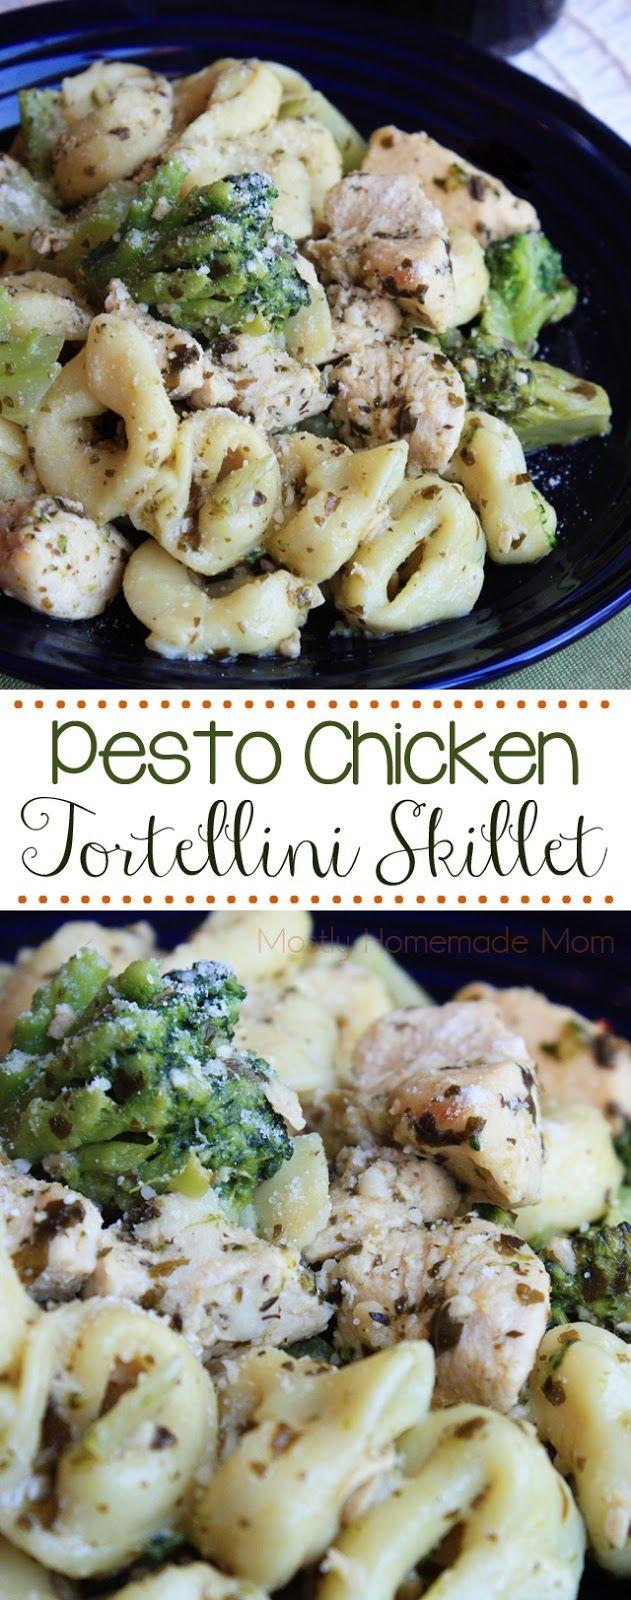 Pesto Chicken Tortellini Skillet - Chicken, cheese tortellini, and broccoli sauteed in a lemony pesto sauce - the perfect weeknight dinner!